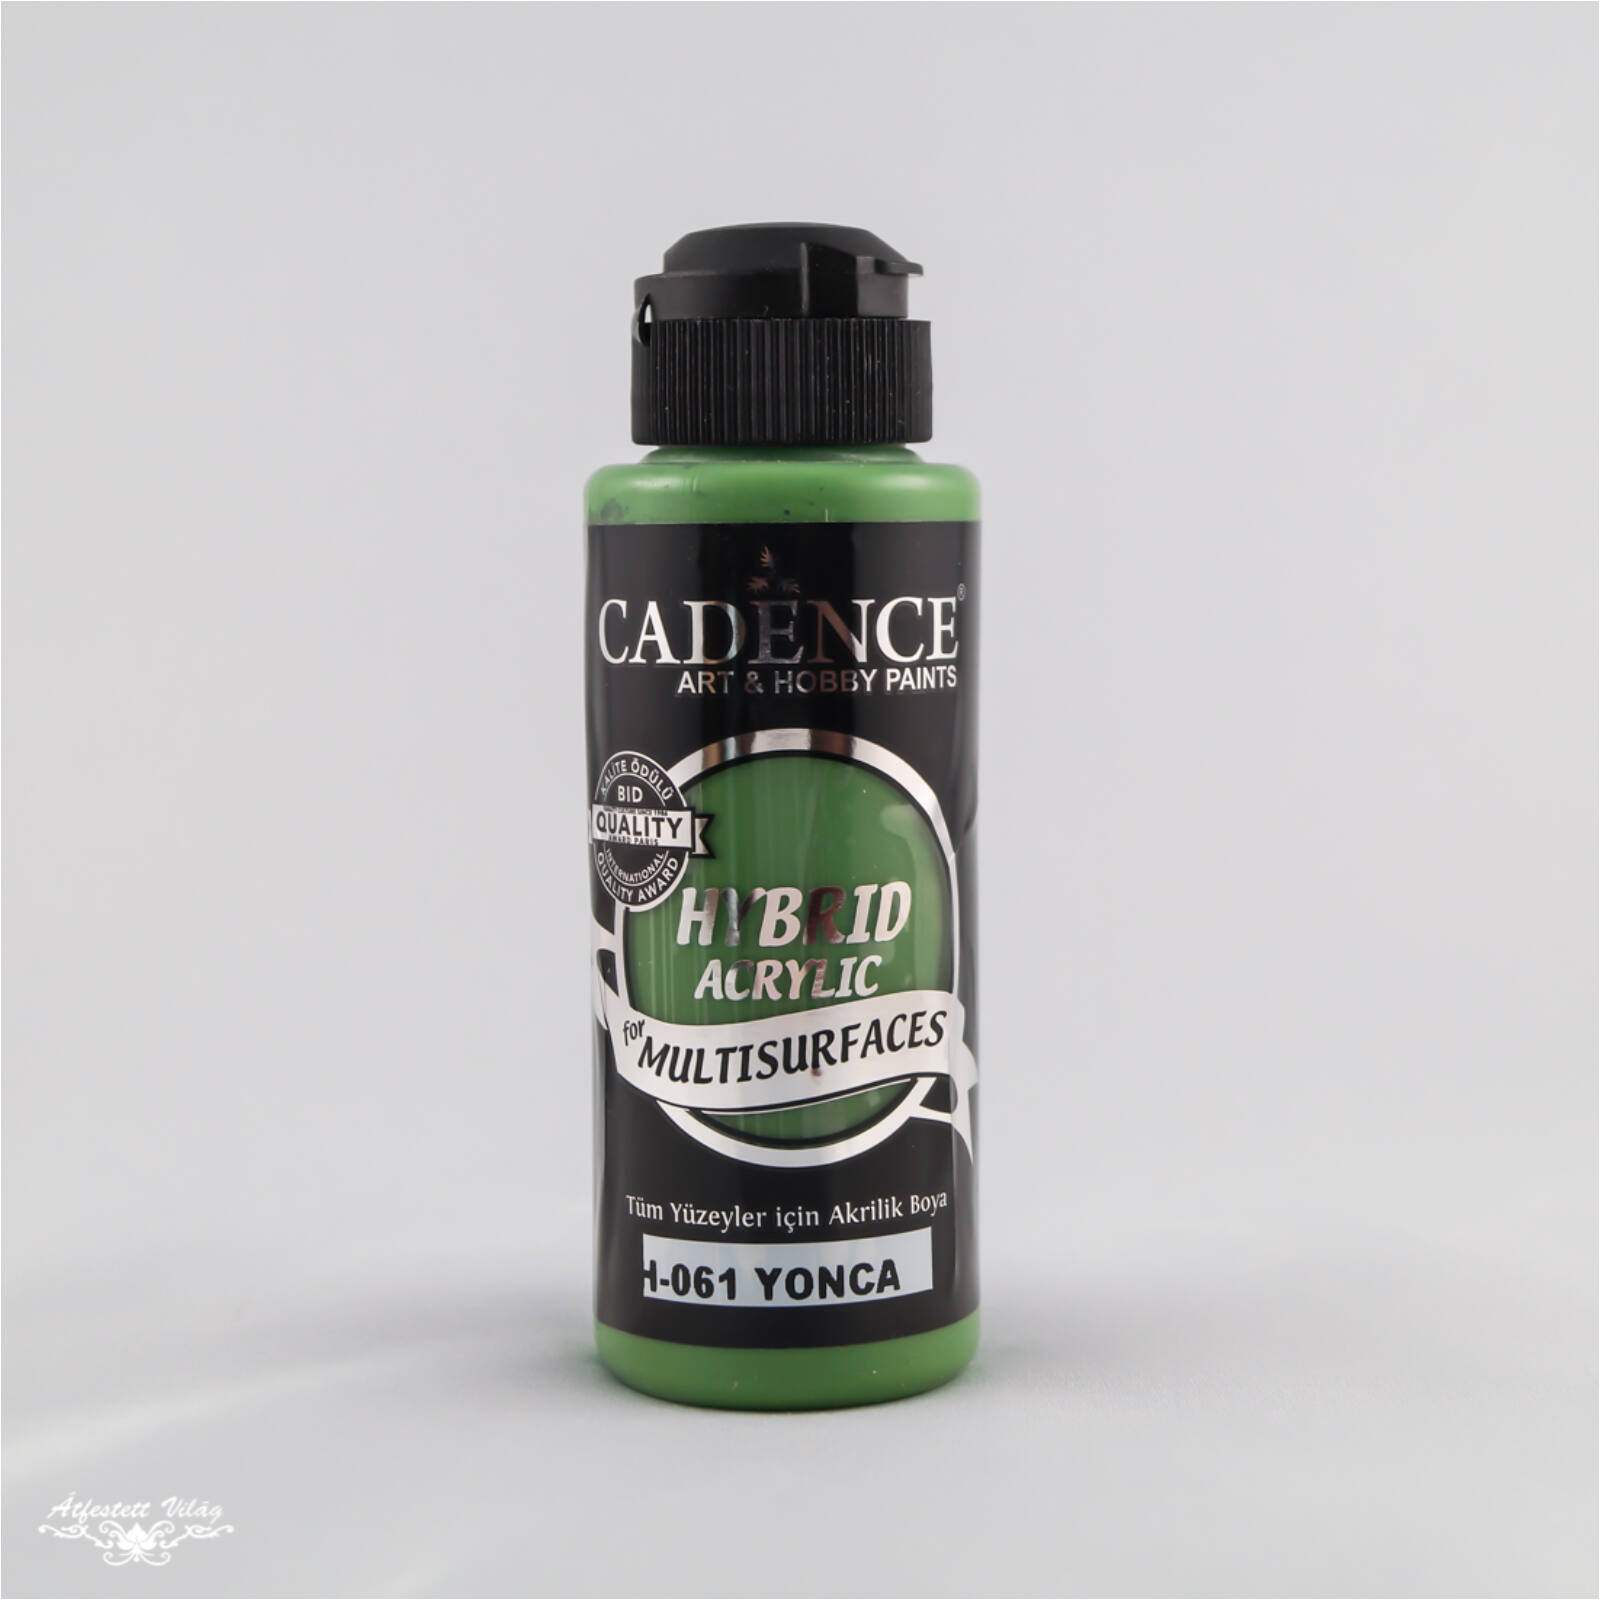 HYBRID Akrilfesték [Clover Green] 120 ml